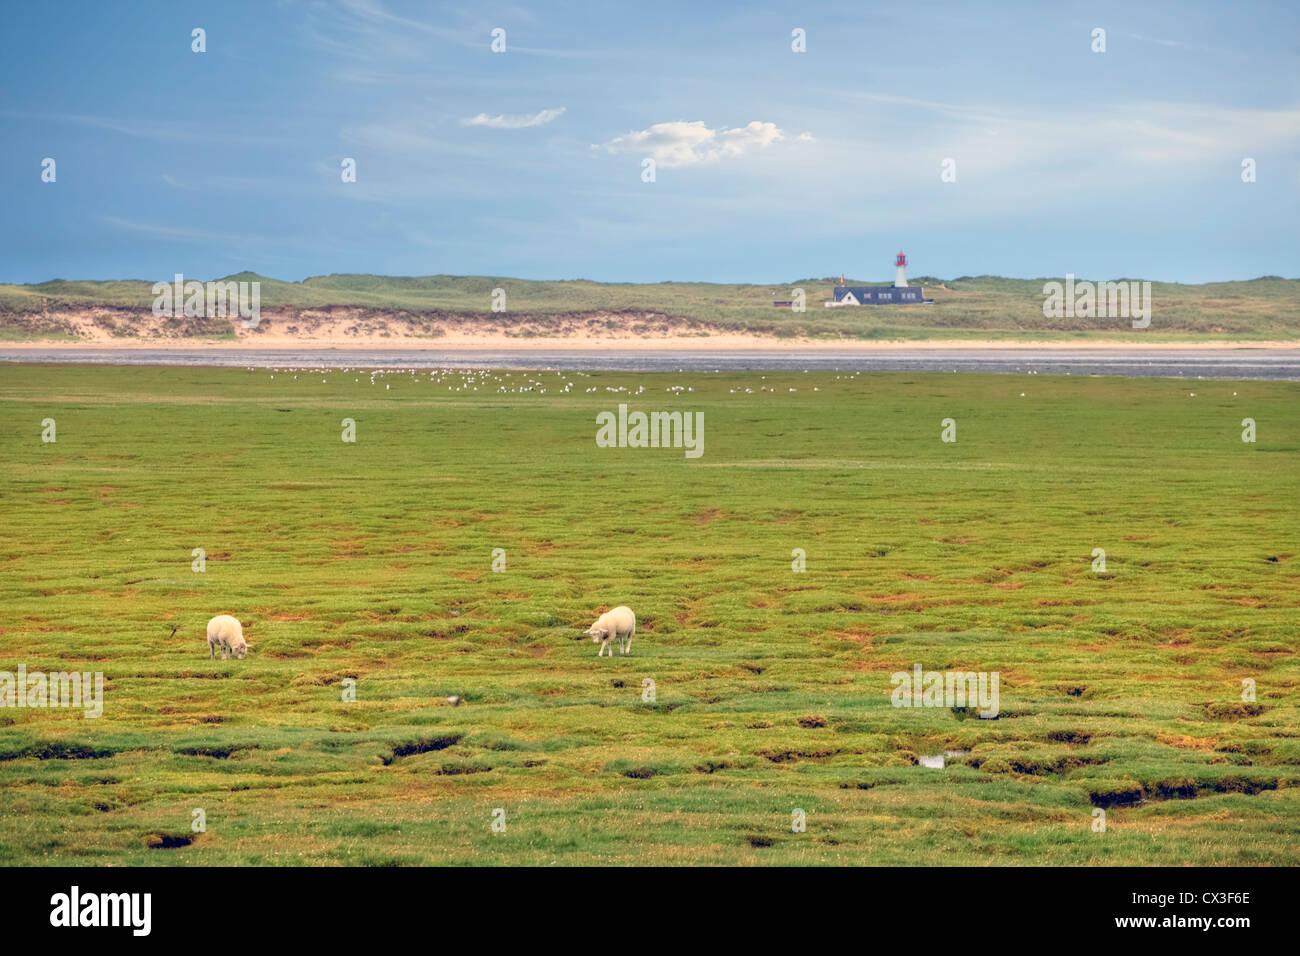 Koenig harbor, elbows, Wadden Sea, mudflats, Sylt, Schleswig-Holstein, Germany - Stock Image